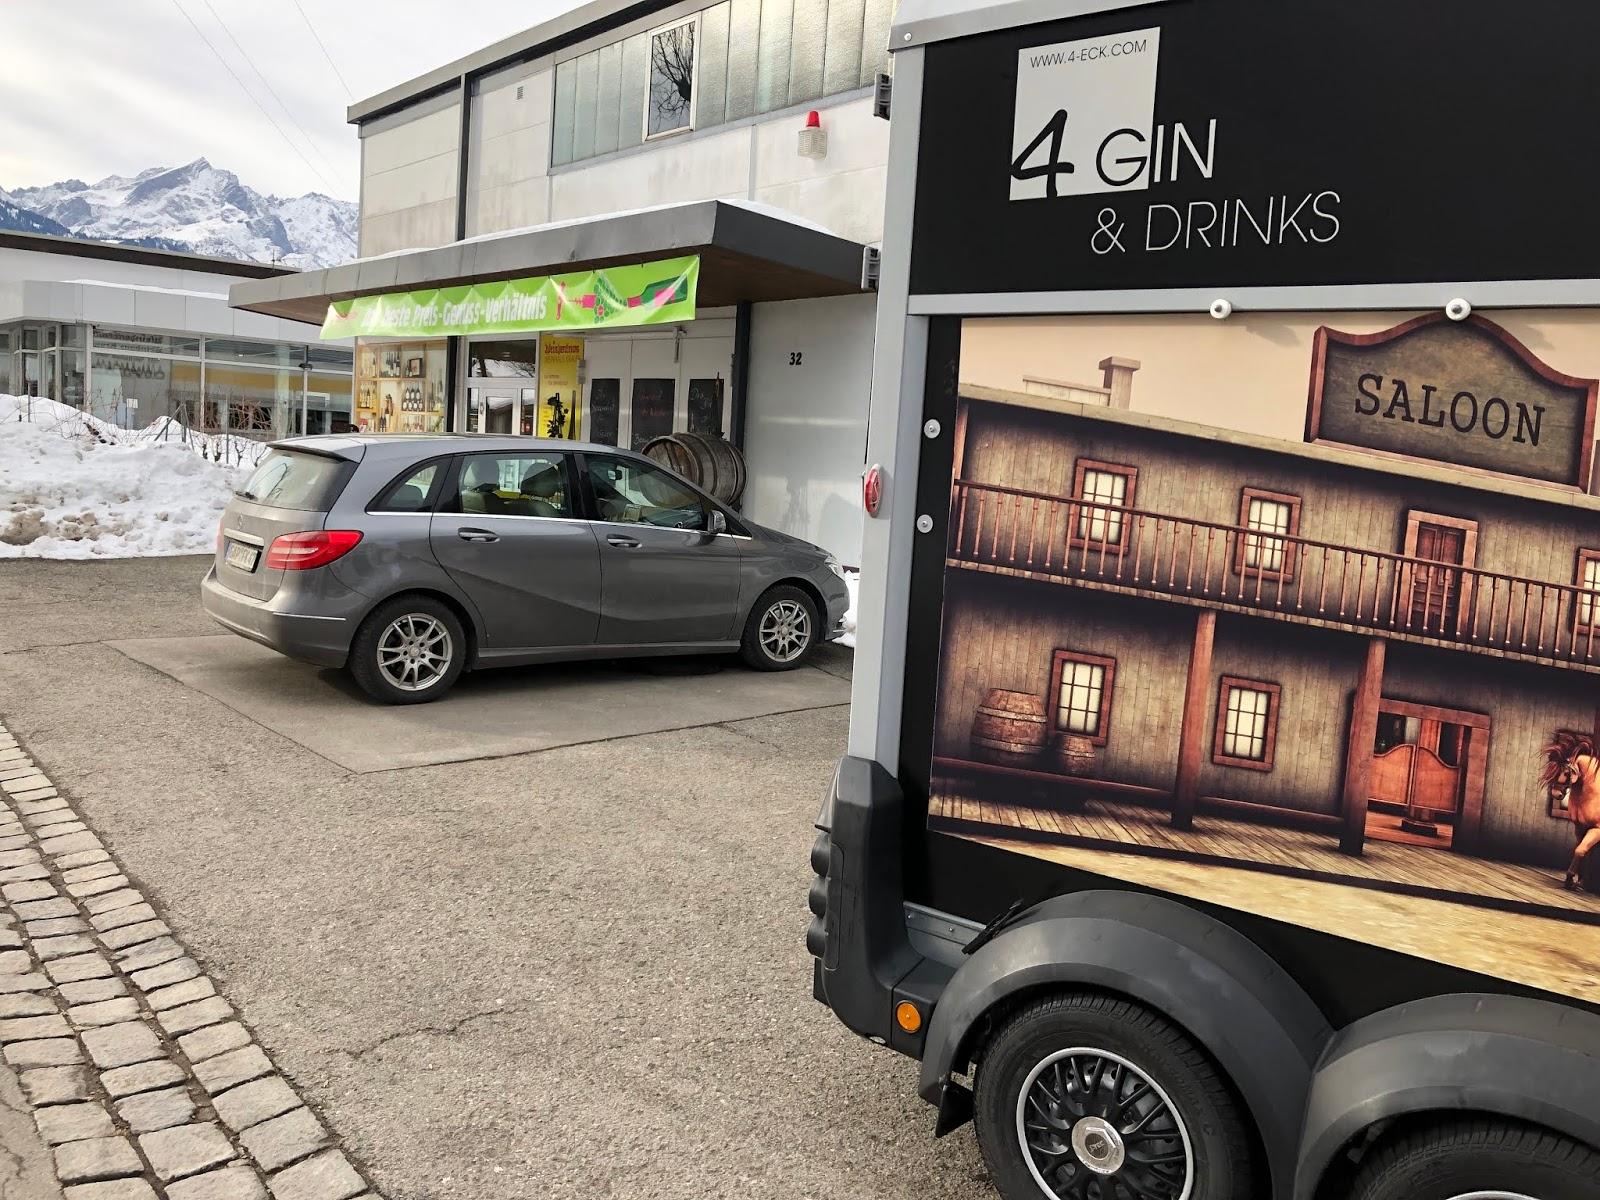 Partner Weinhaus Kraus, 4 Gin and Drinks, Horseboxbar, Event-Bar, mobile Bar, Bayern, Garmisch-Partenkirchen, Gin-Bar, Oberammergau, König-Ludwig-Lauf